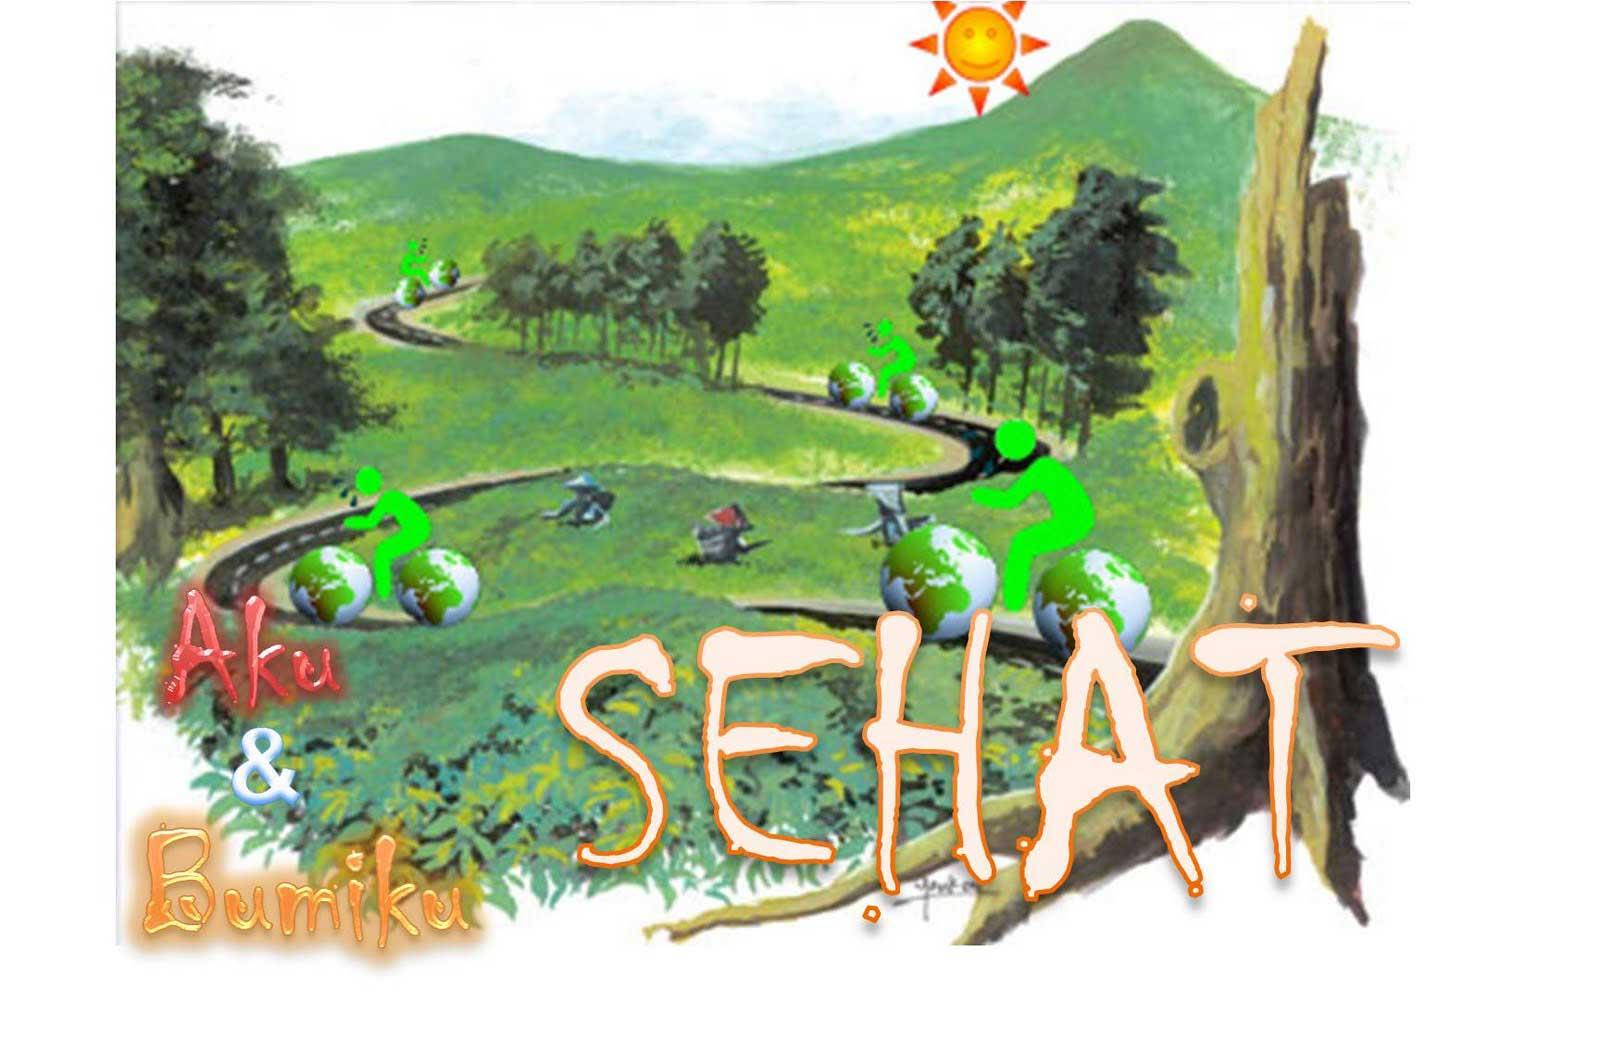 Contoh Poster Kesehatan Lingkungan Thegorbalsla